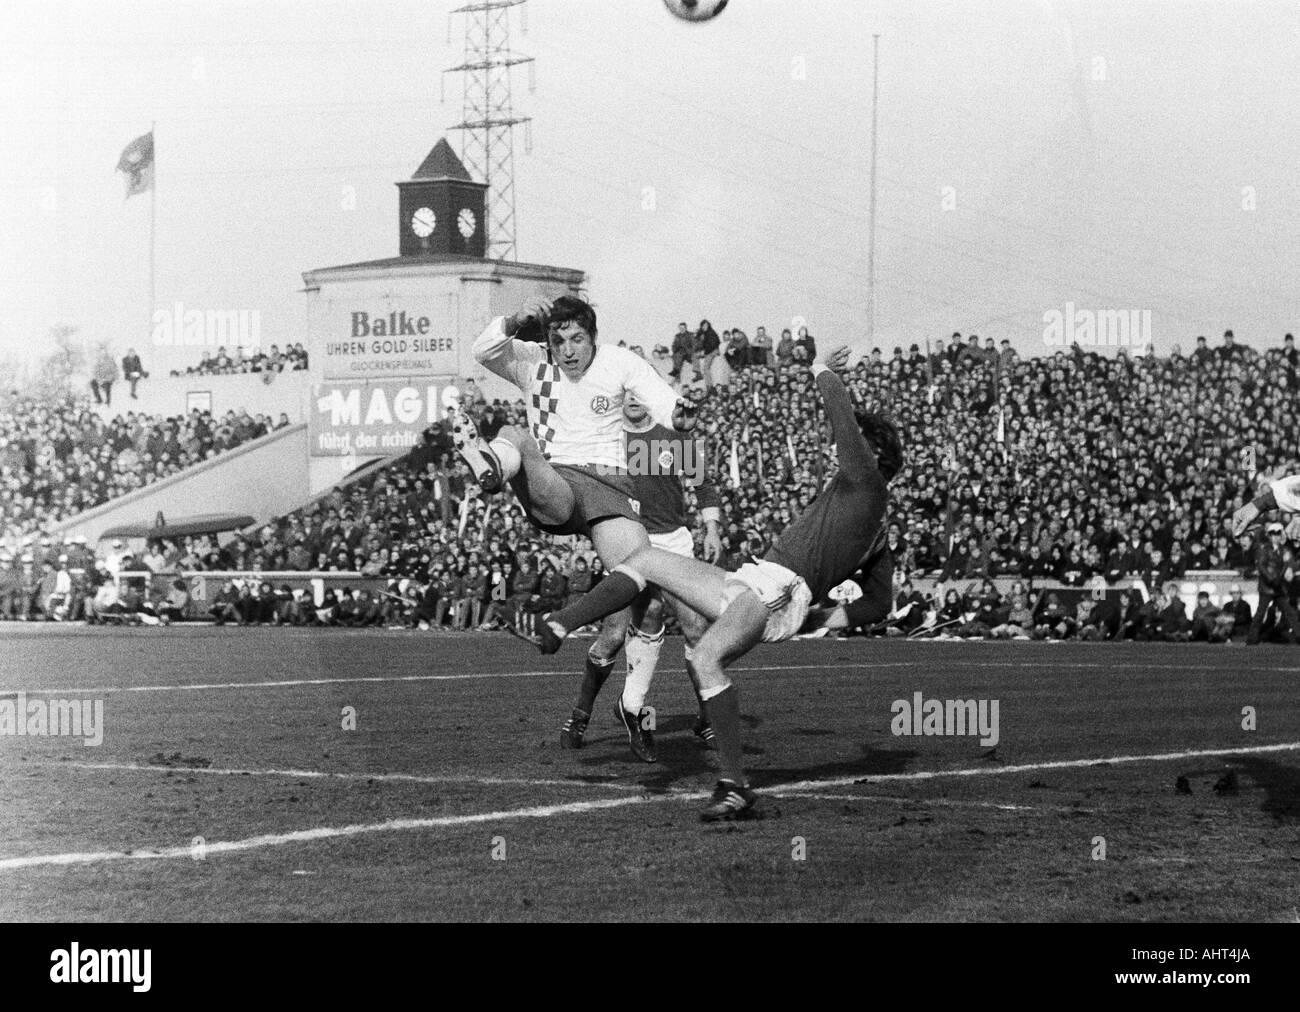 football, Bundesliga, 1970/1971, Niederrhein Stadium, Rot-Weiss Oberhausen versus Rot-Weiss Essen 0:0, scene of the match, Roland Peitsch (RWE) left and two Oberhausen players - Stock Image